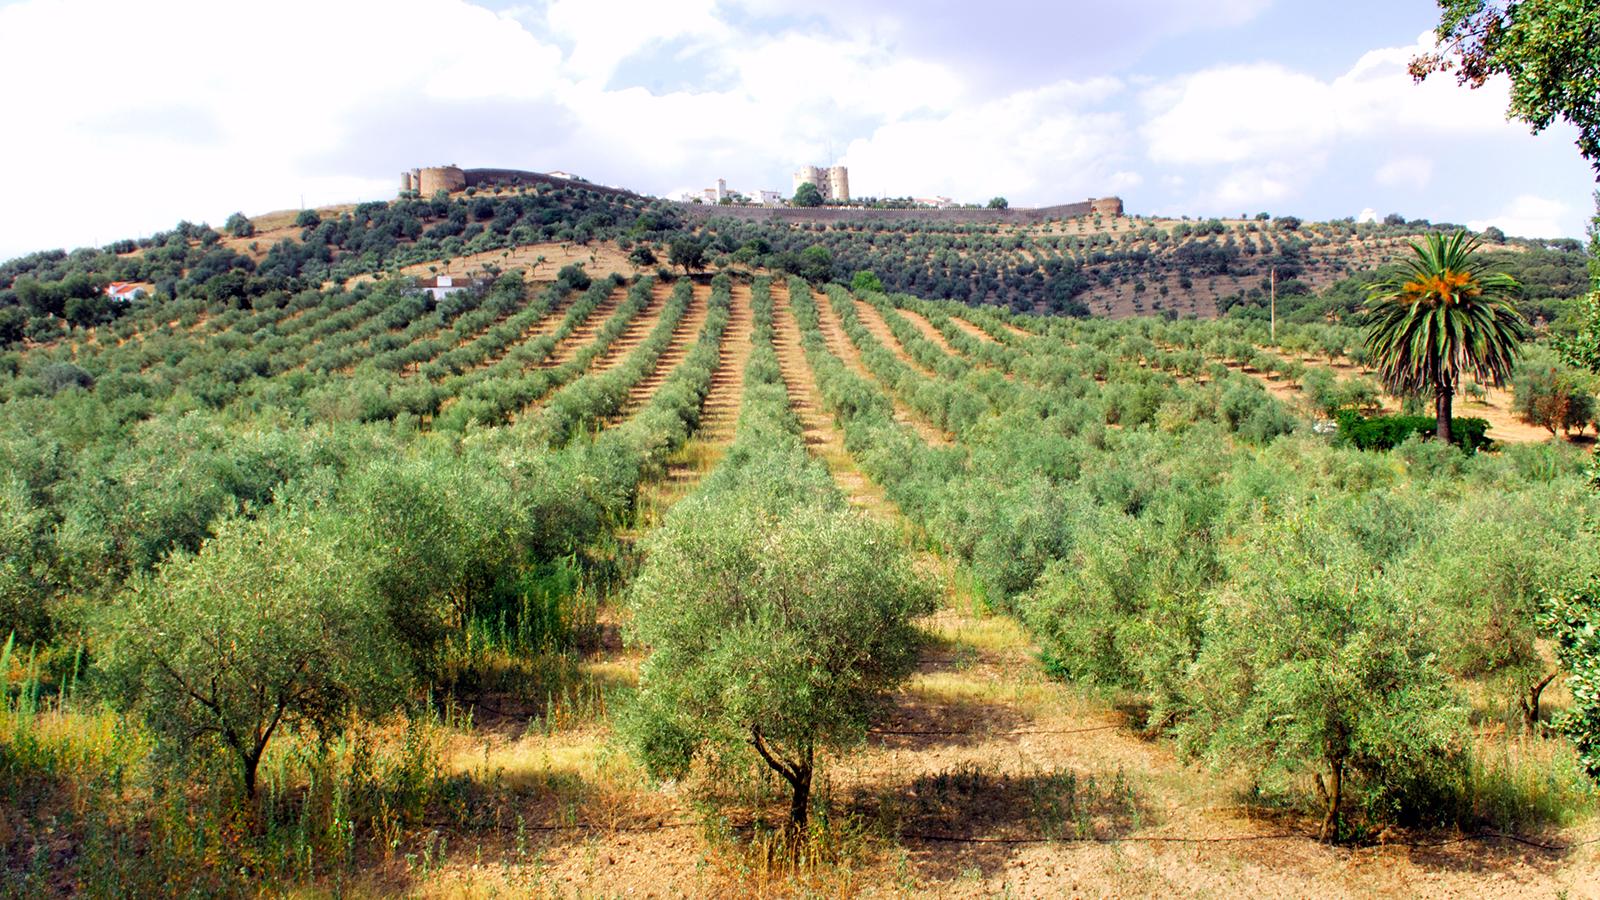 portugal-olive-trees.ngsversion.1412613051473.jpg